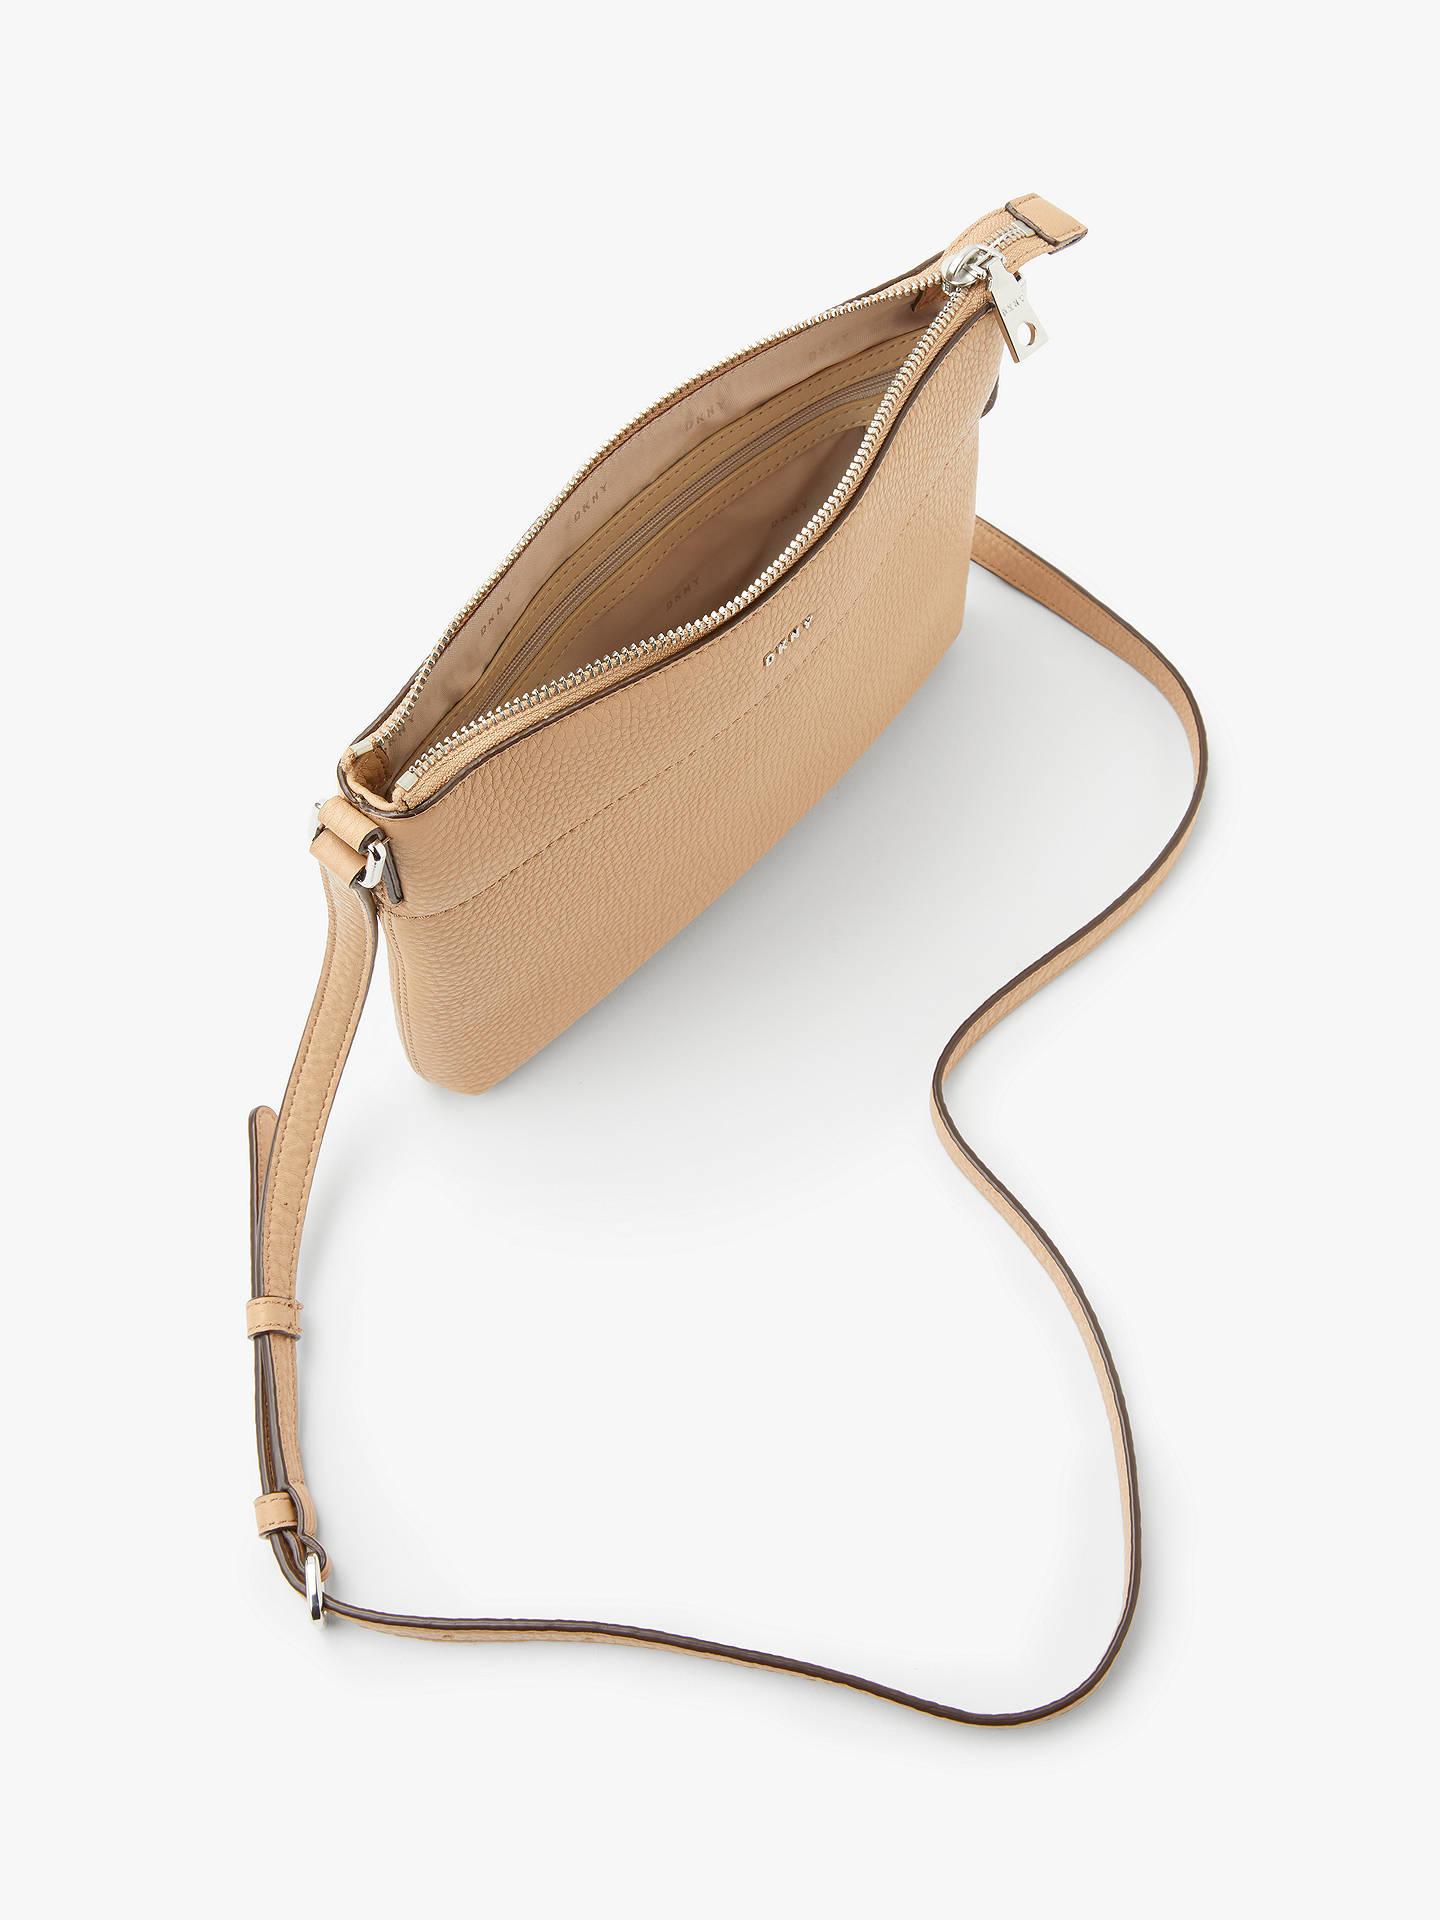 47e3088113e5 DKNY Bellah Leather Cross Body Bag, Camel